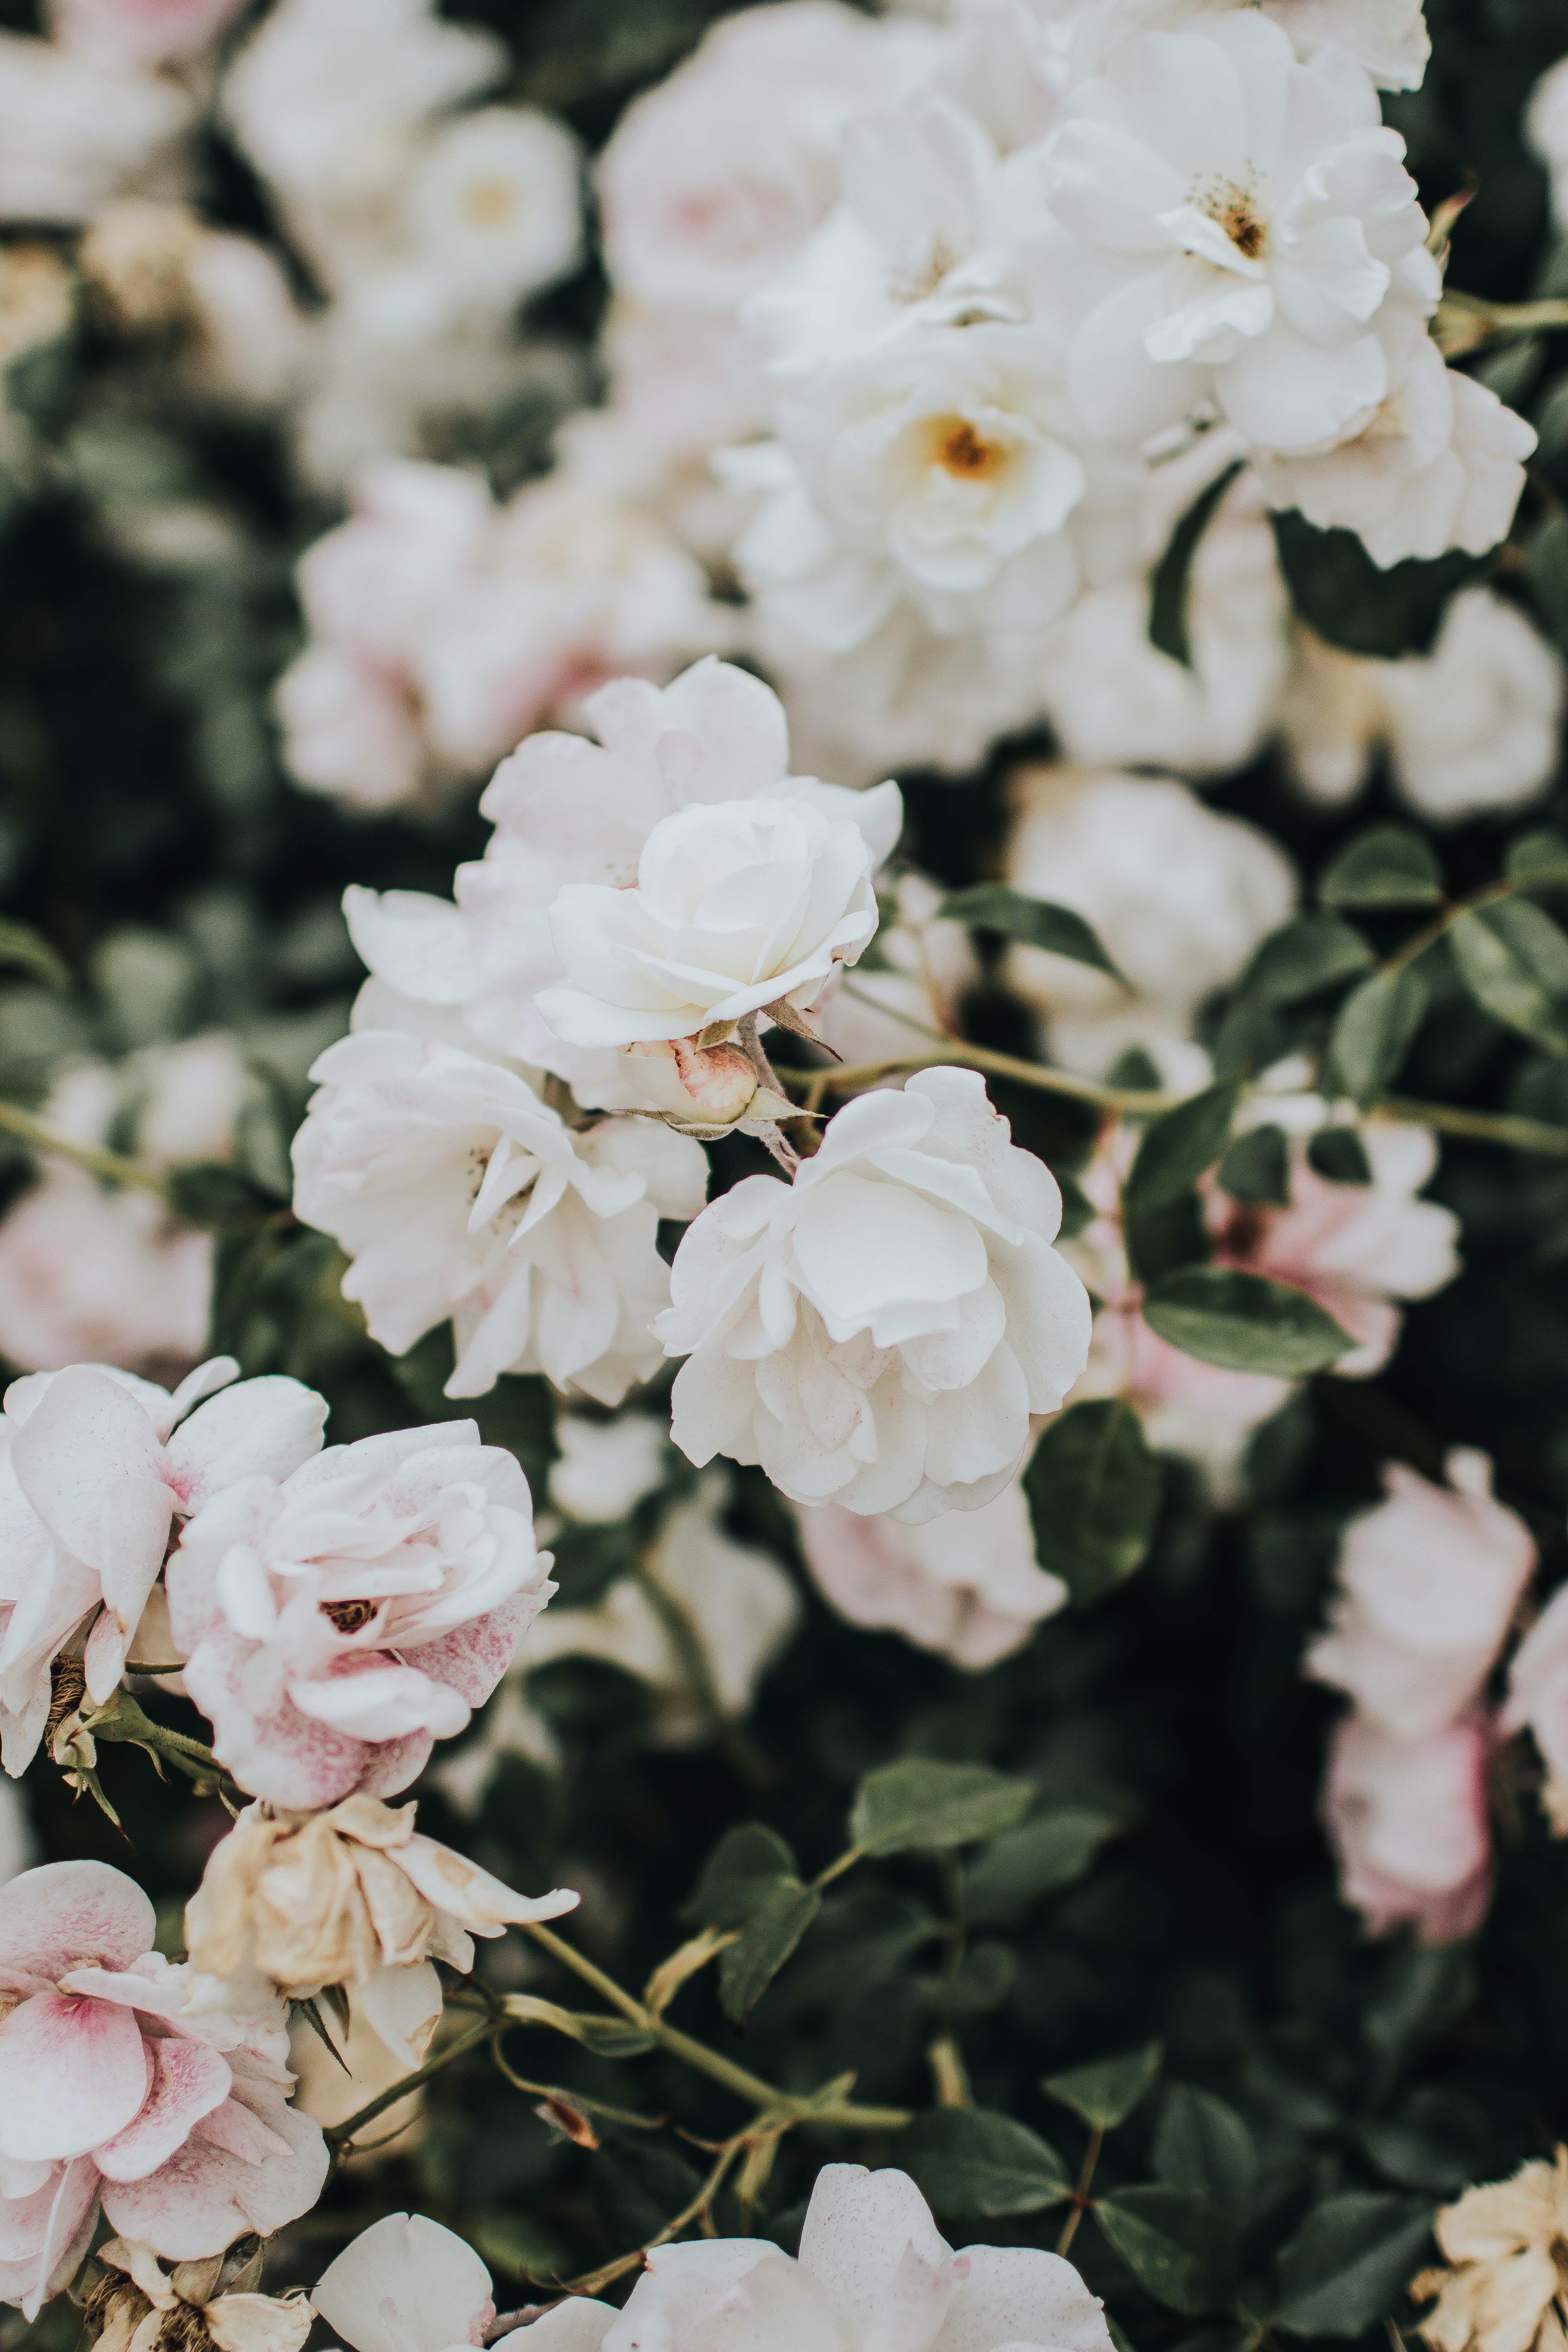 white petal flowers blooming during daytime